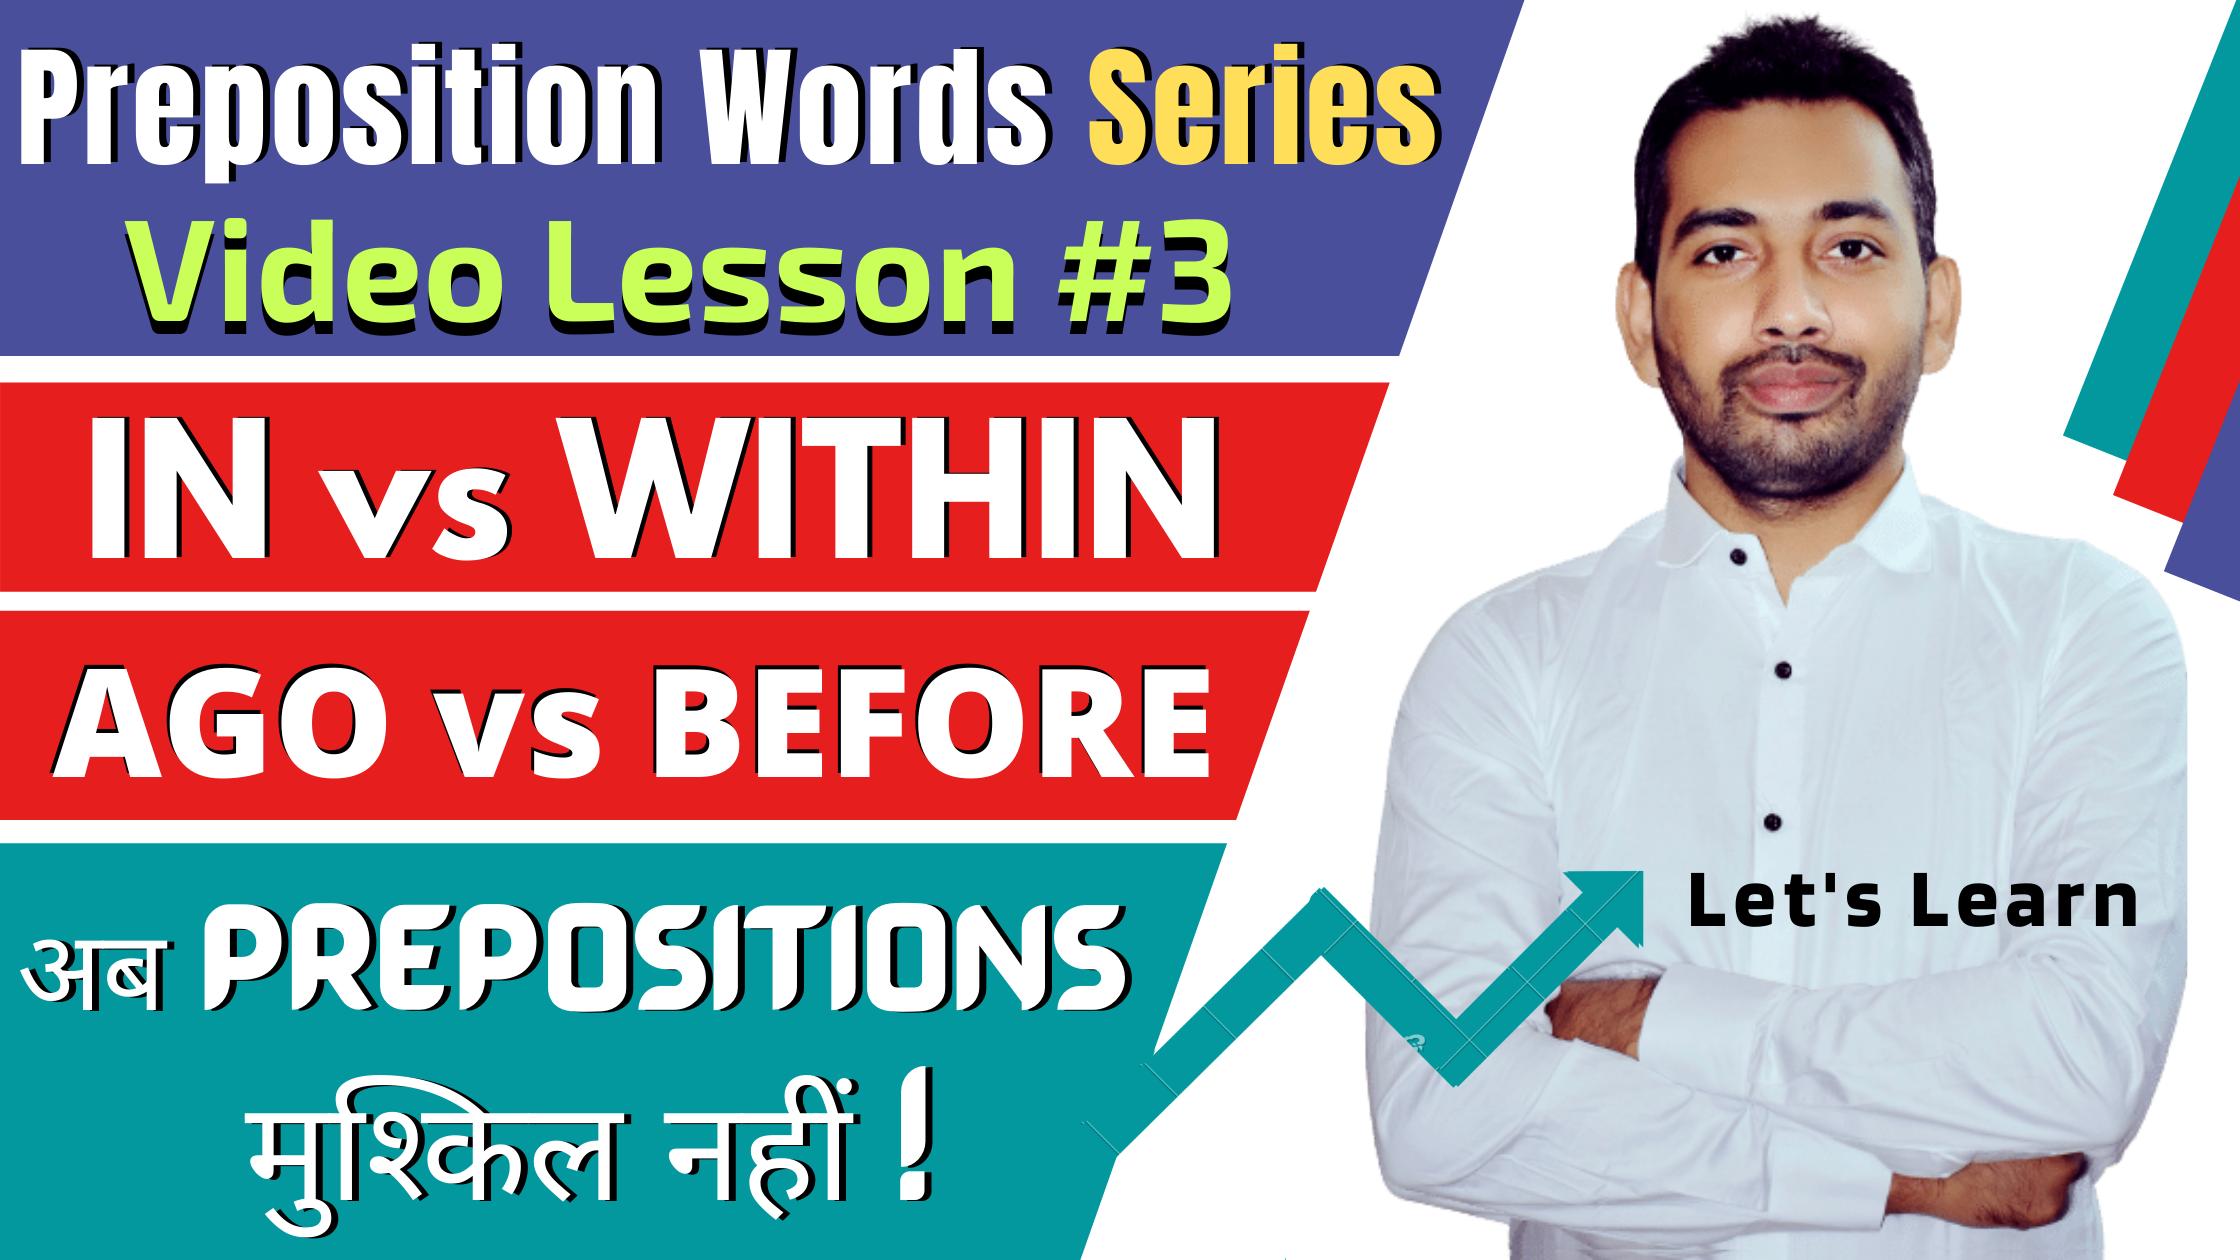 preposition words